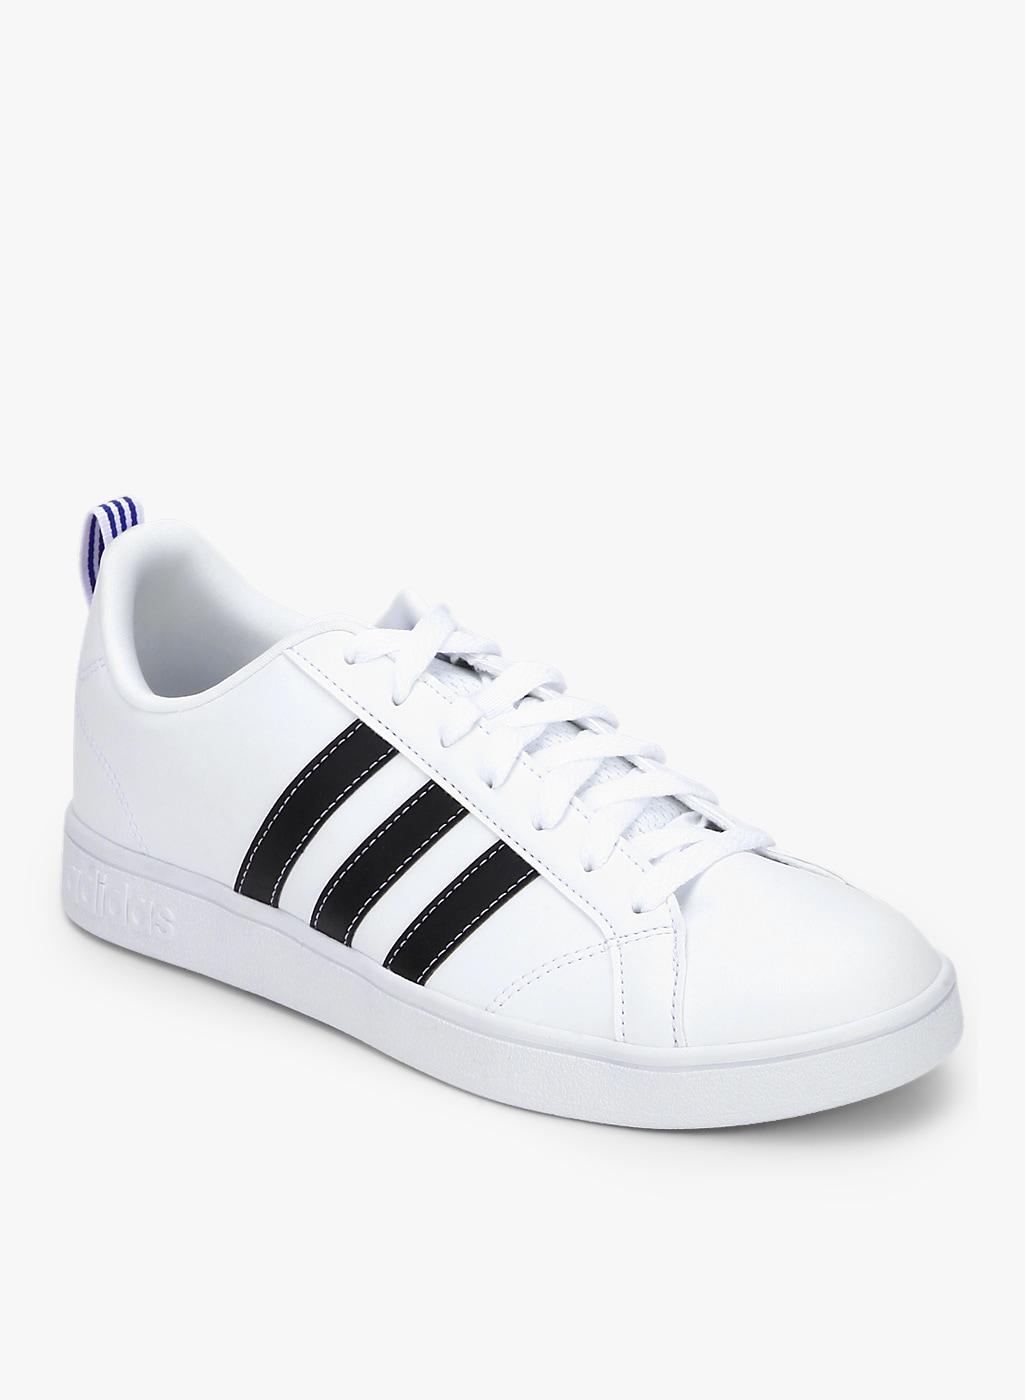 the best attitude f9ea6 0915c Adidas Motorola Socks Casual Shoes - Buy Adidas Motorola Socks Casual Shoes  online in India